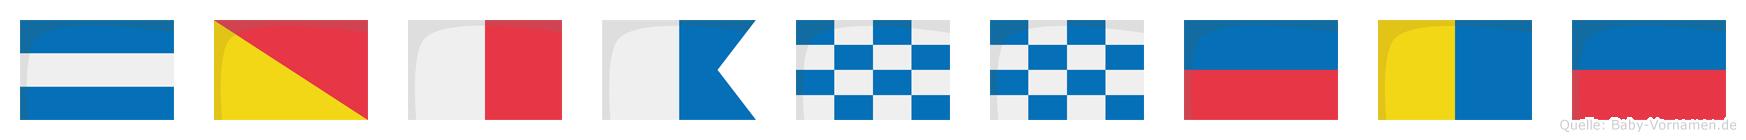 Johanneke im Flaggenalphabet